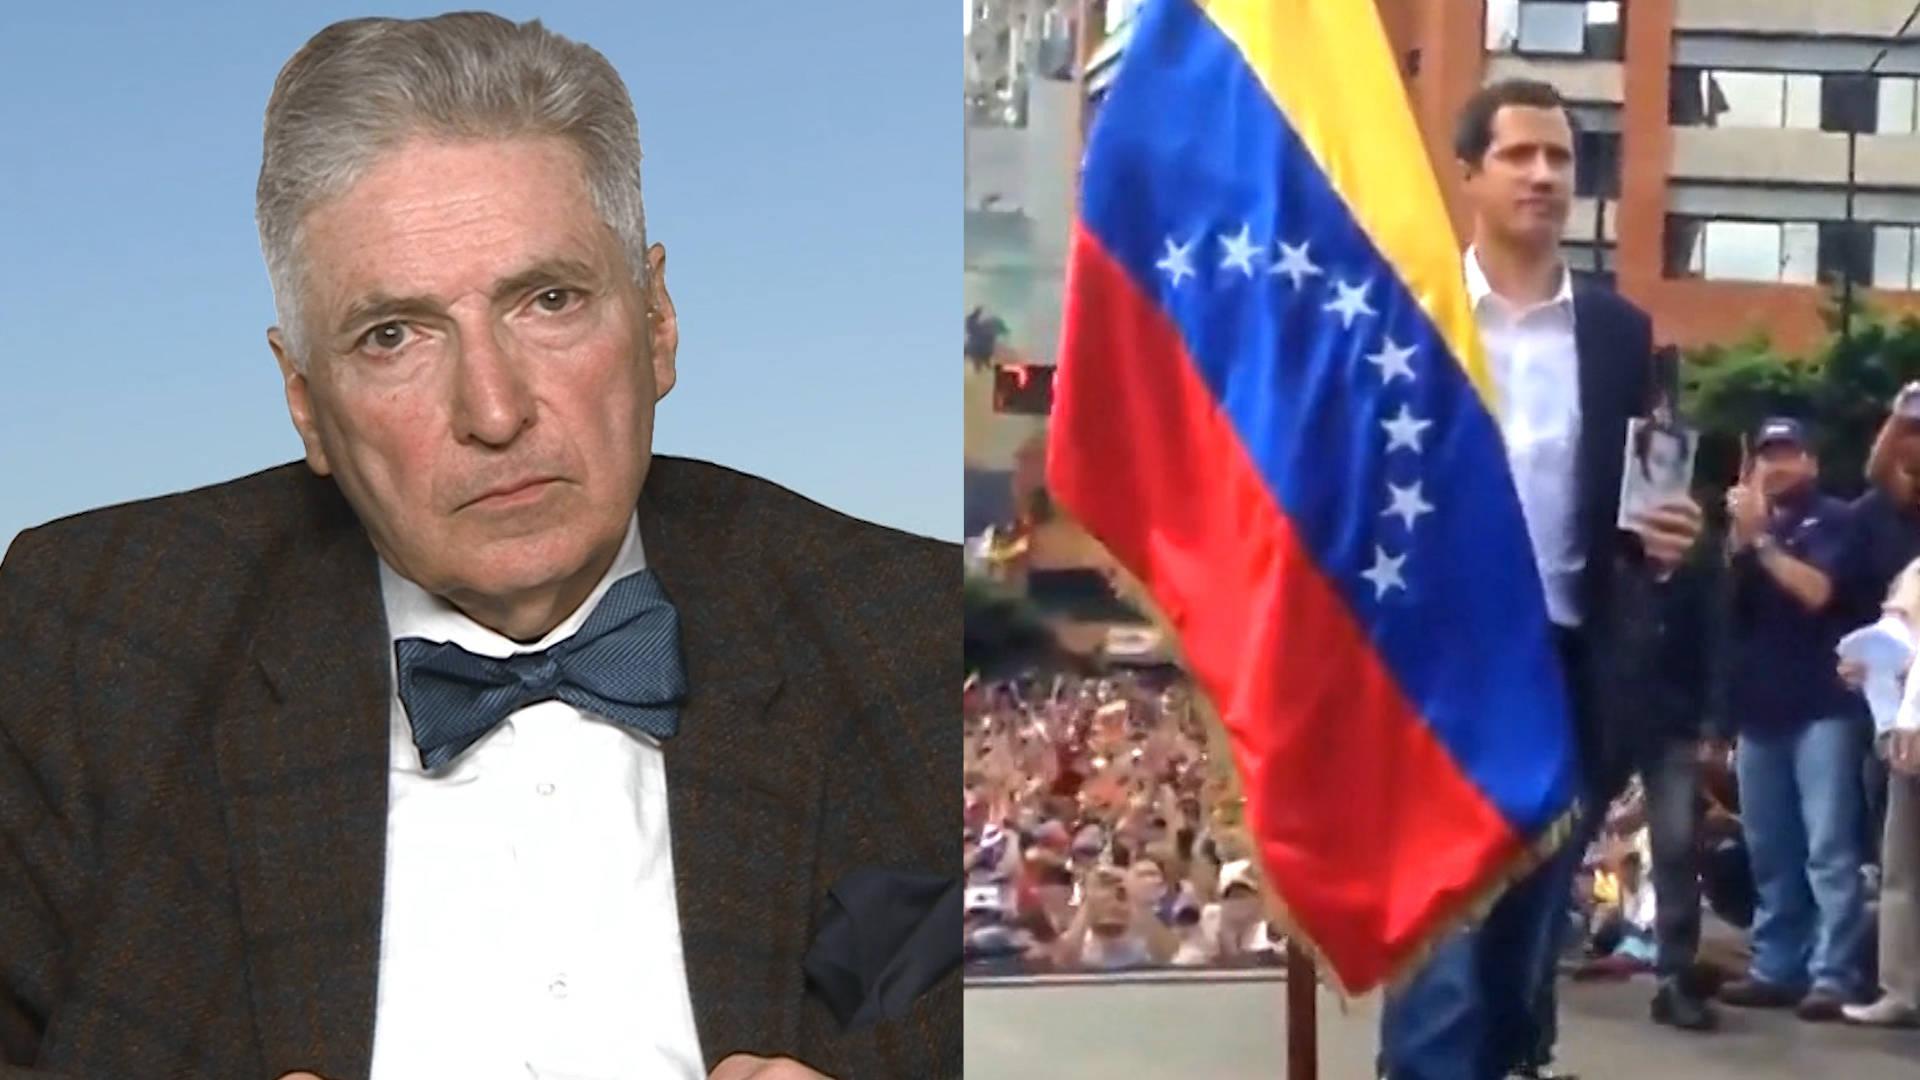 Former U.N. Expert: The U.S. Is Violating International Law by Attempting a Coup in Venezuela